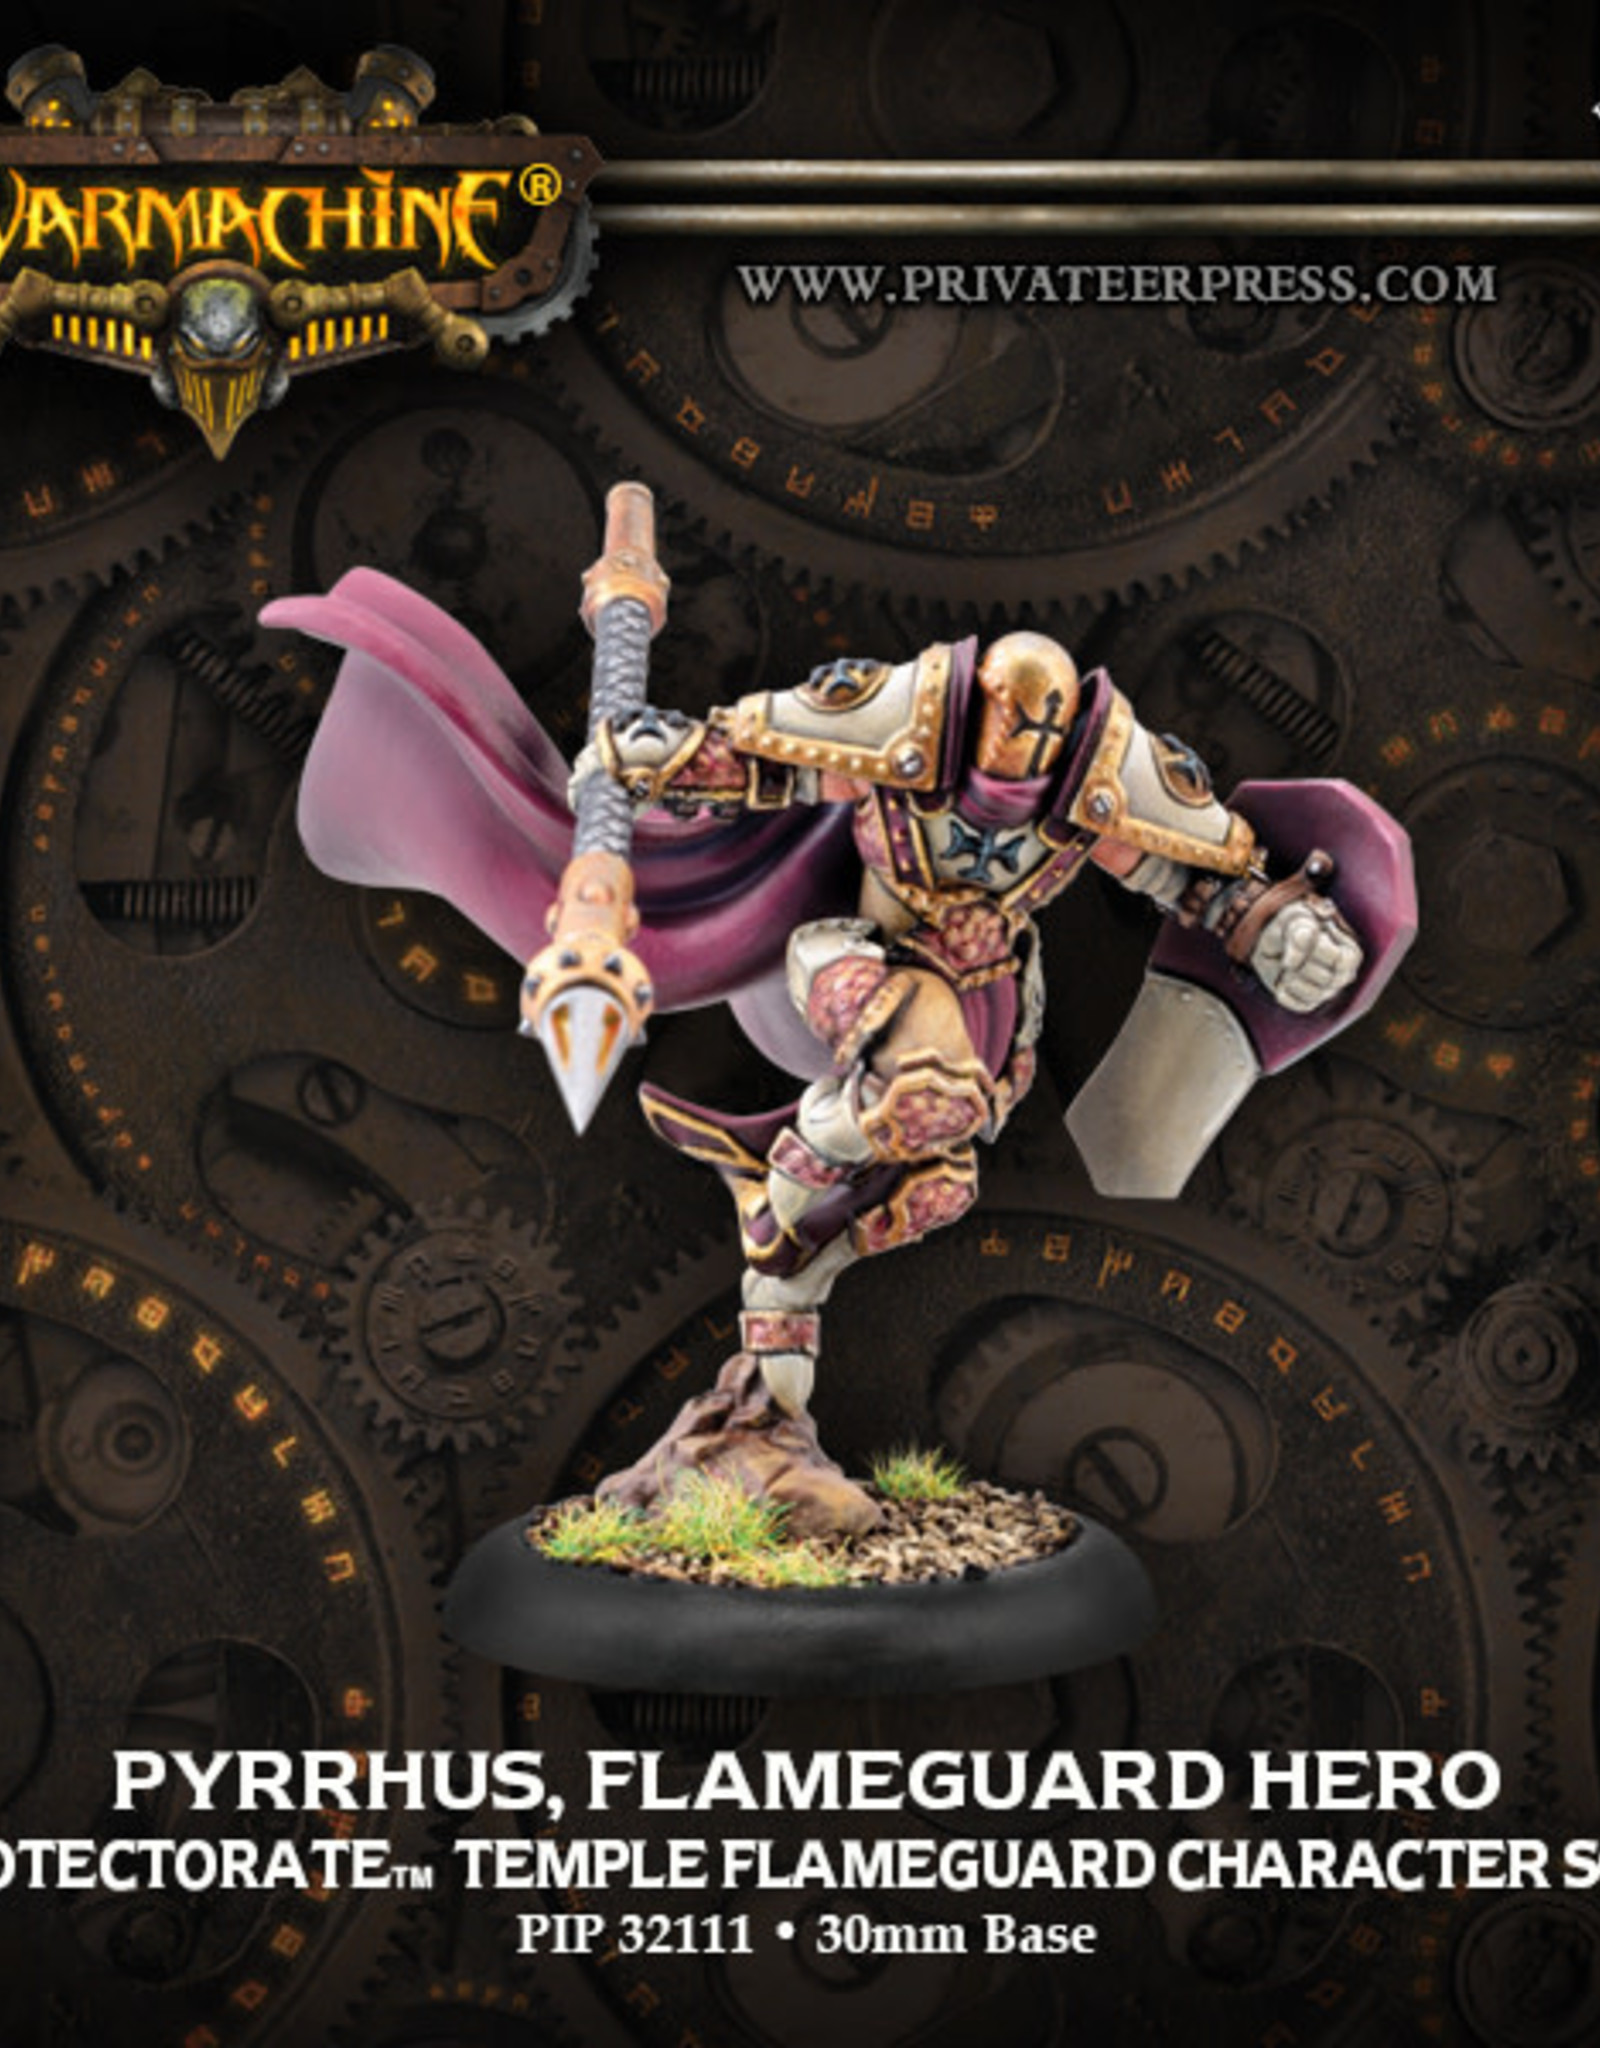 Warmachine Protectorate - Pyrrhus Flameguard Hero